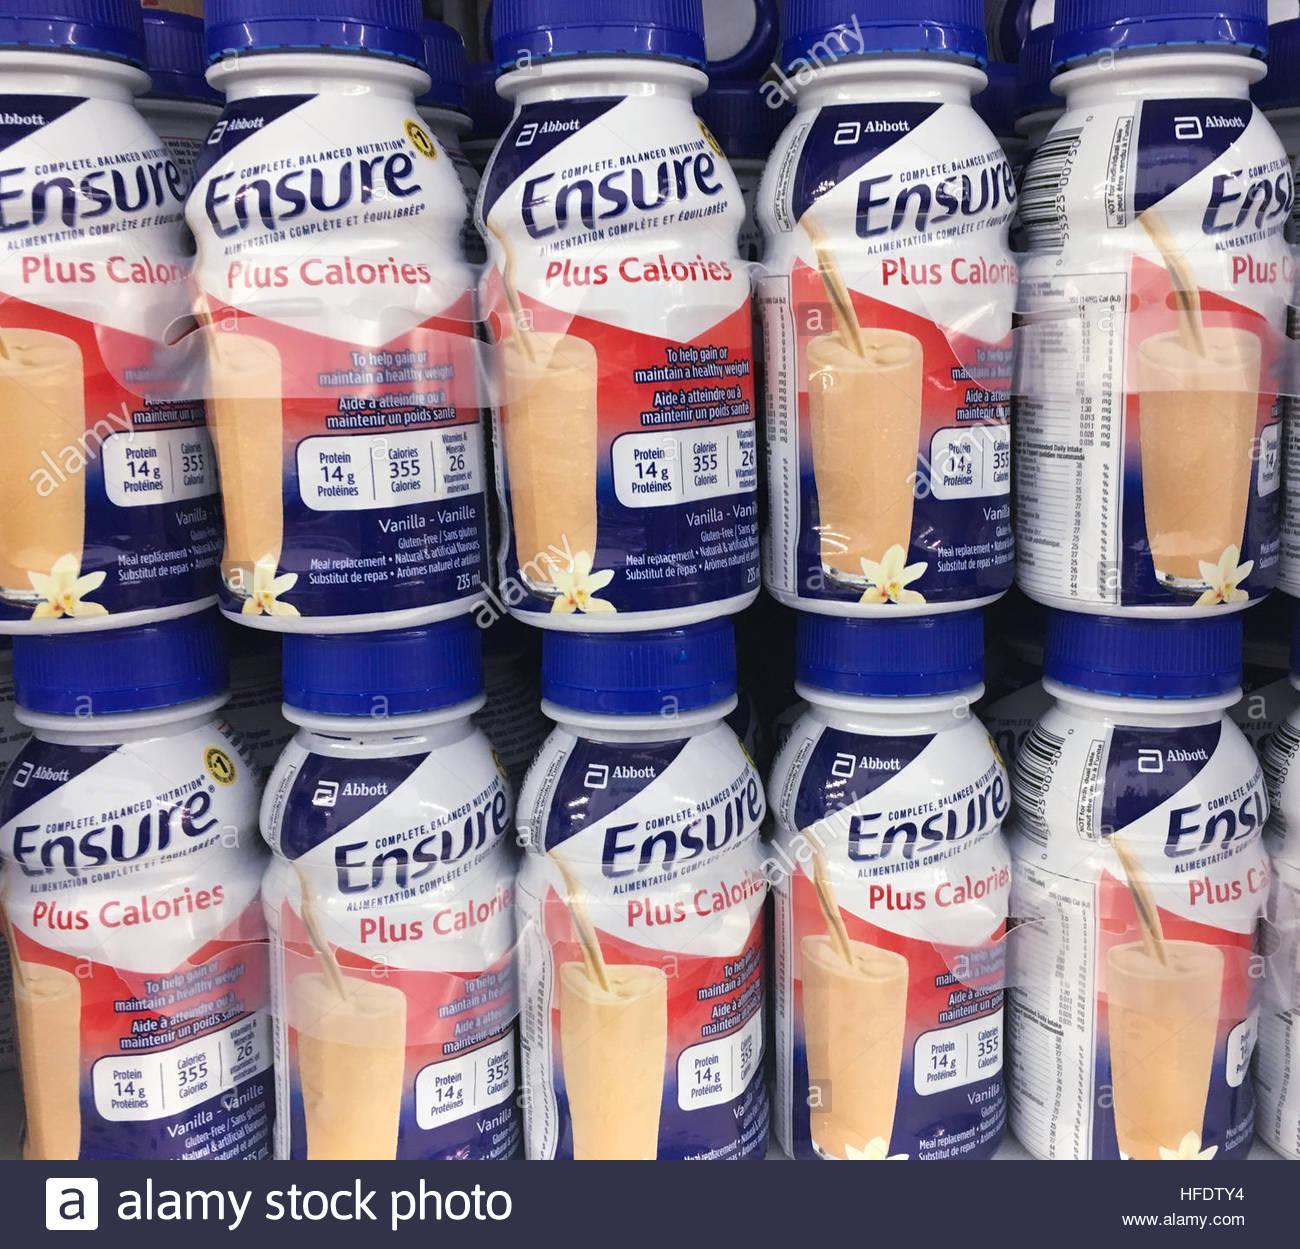 Ensure Plus Calories bottles stacked on a supermarket shelf  Ensure